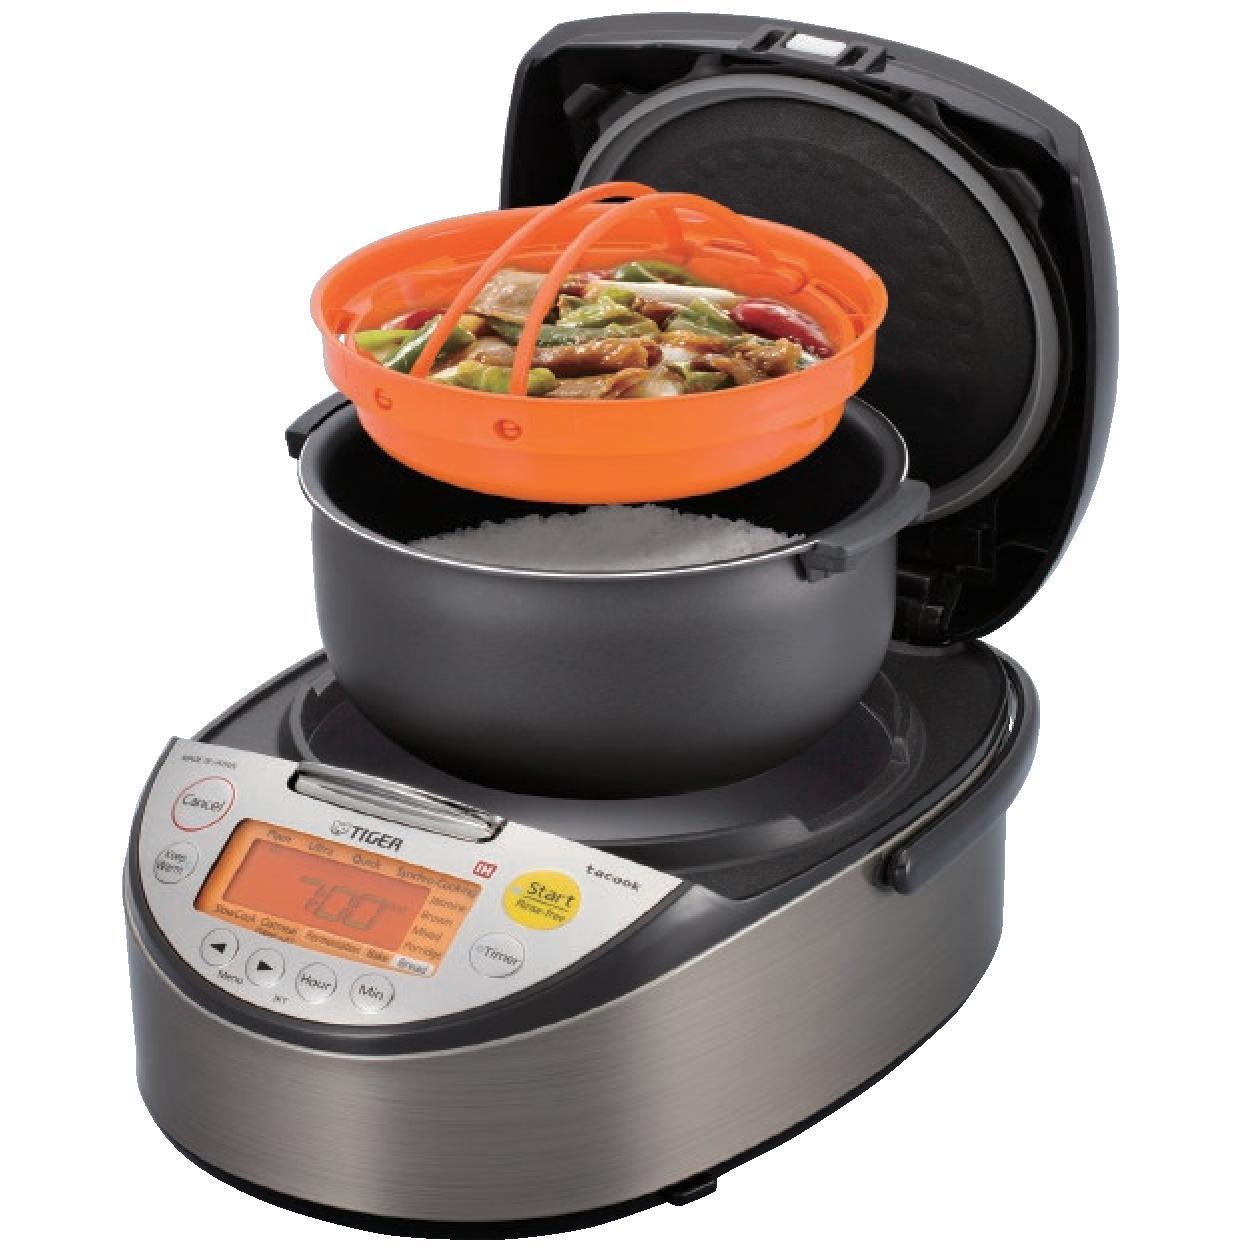 Amazon.com: Tiger Corporation JKT-S10U 5.5-Cup Induction